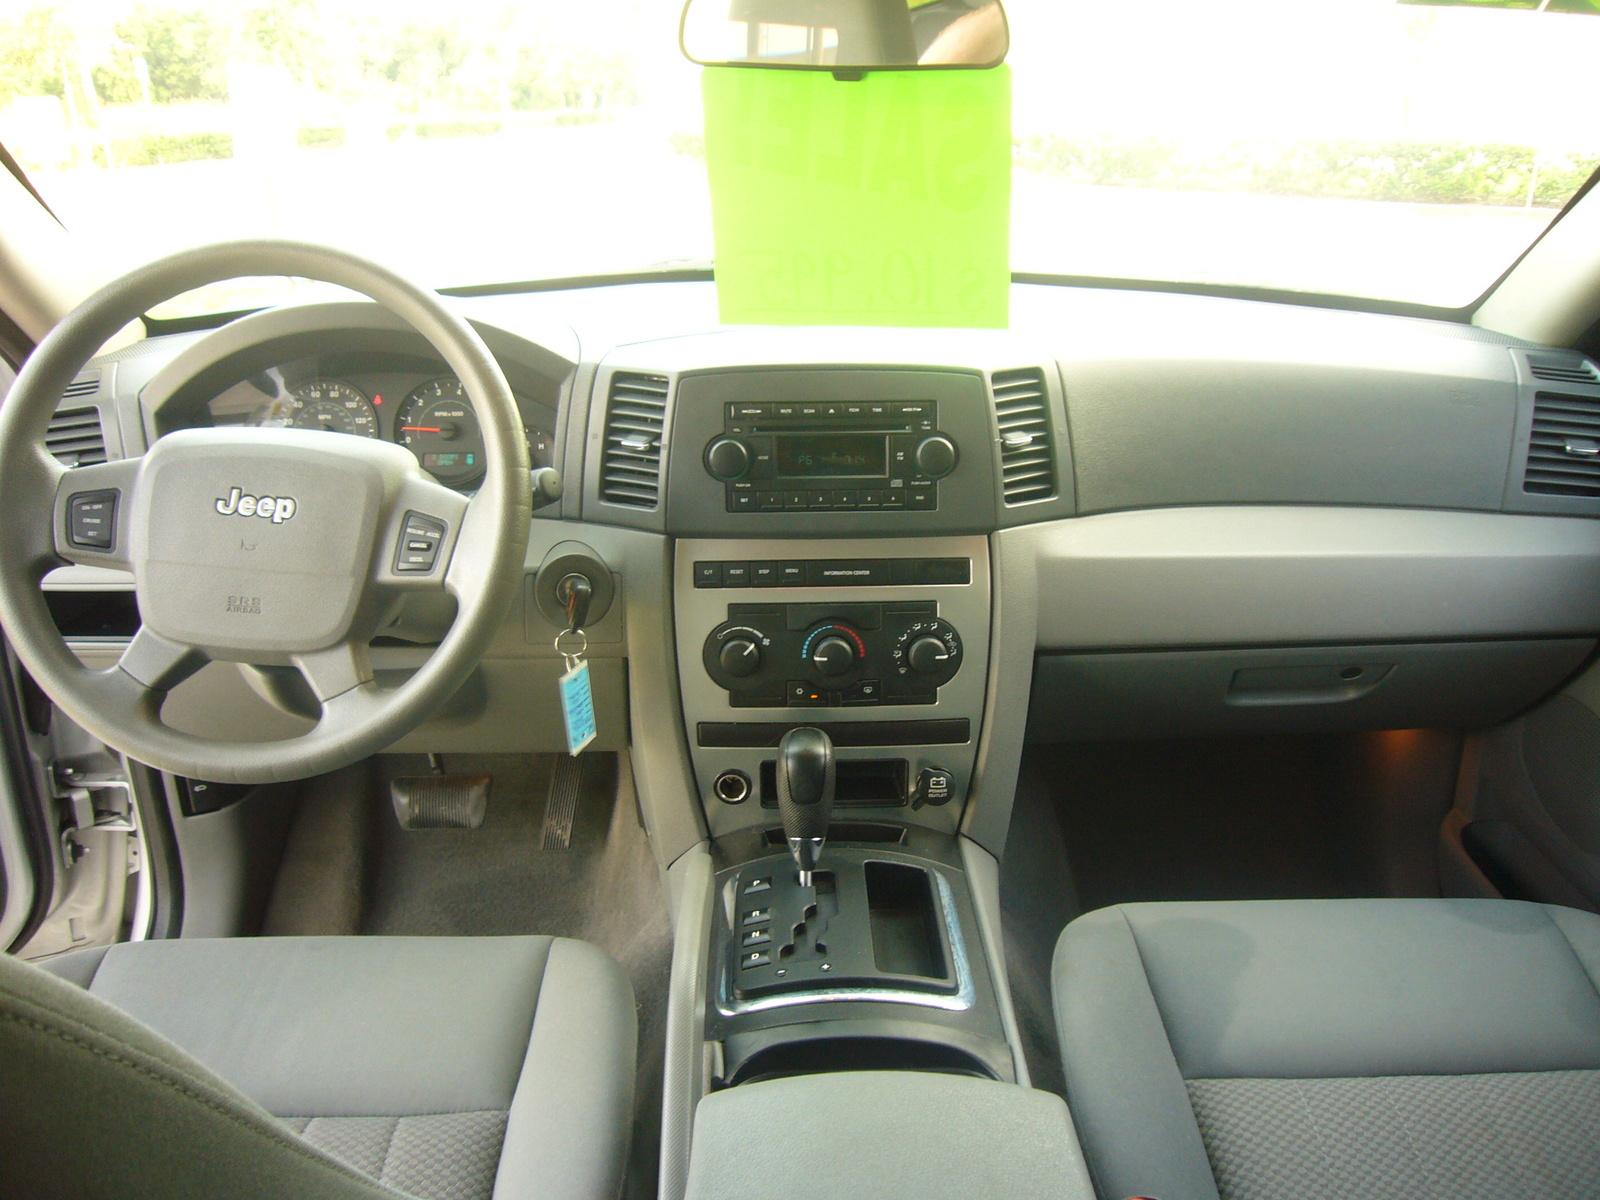 hight resolution of 2005 jeep grand cherokee interior pictures cargurus 2005 jeep grand cherokee 4x4 interior 2005 jeep grand cherokee laredo 4x4 interior